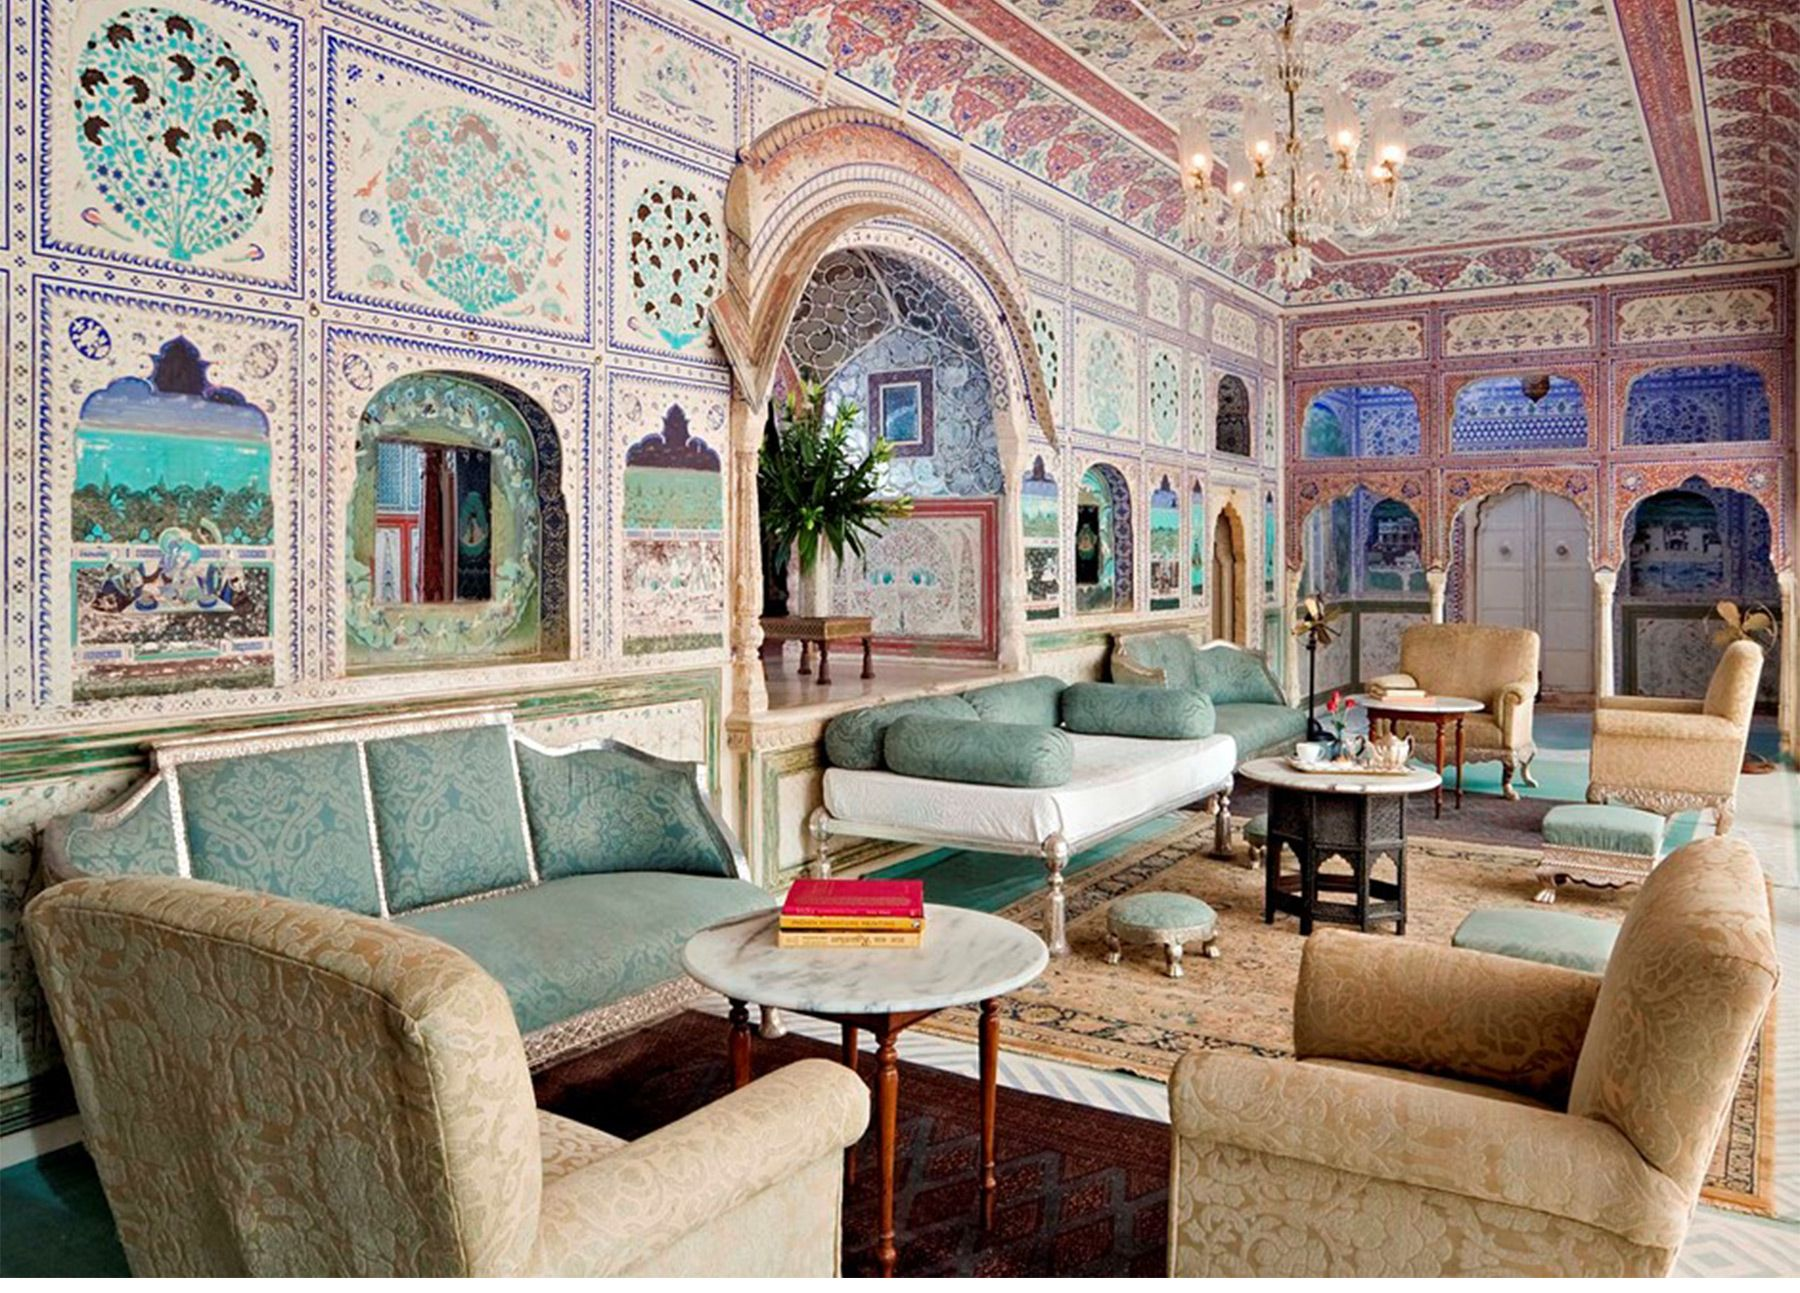 Samode Palace Jaipur Rajasthan India Great Escapes